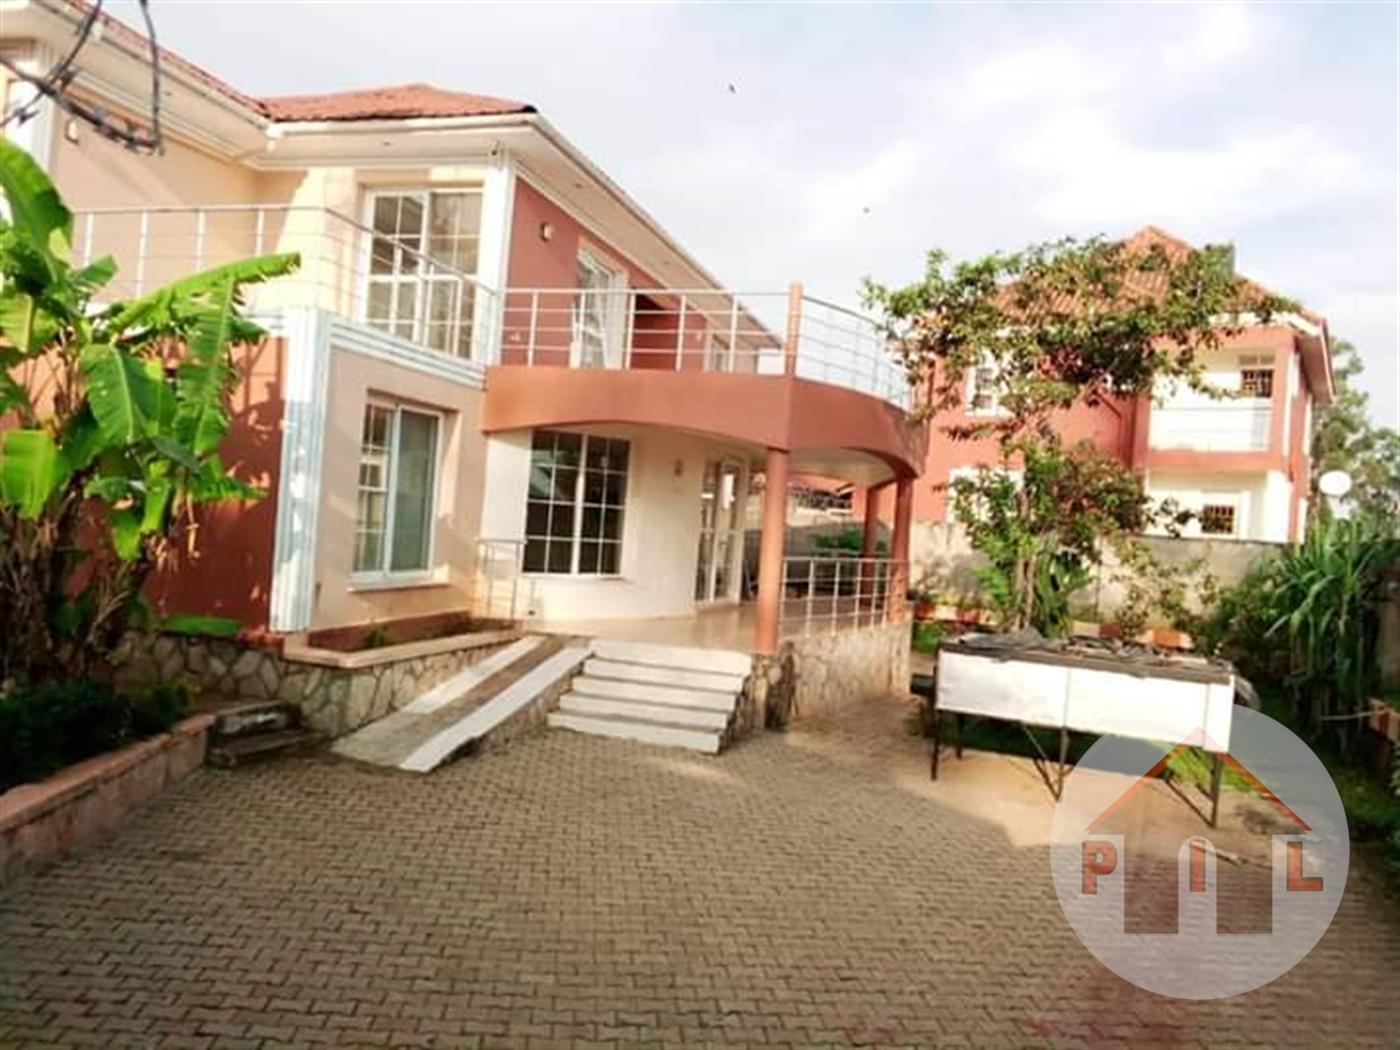 Mansion for sale in Bukasa Kampala